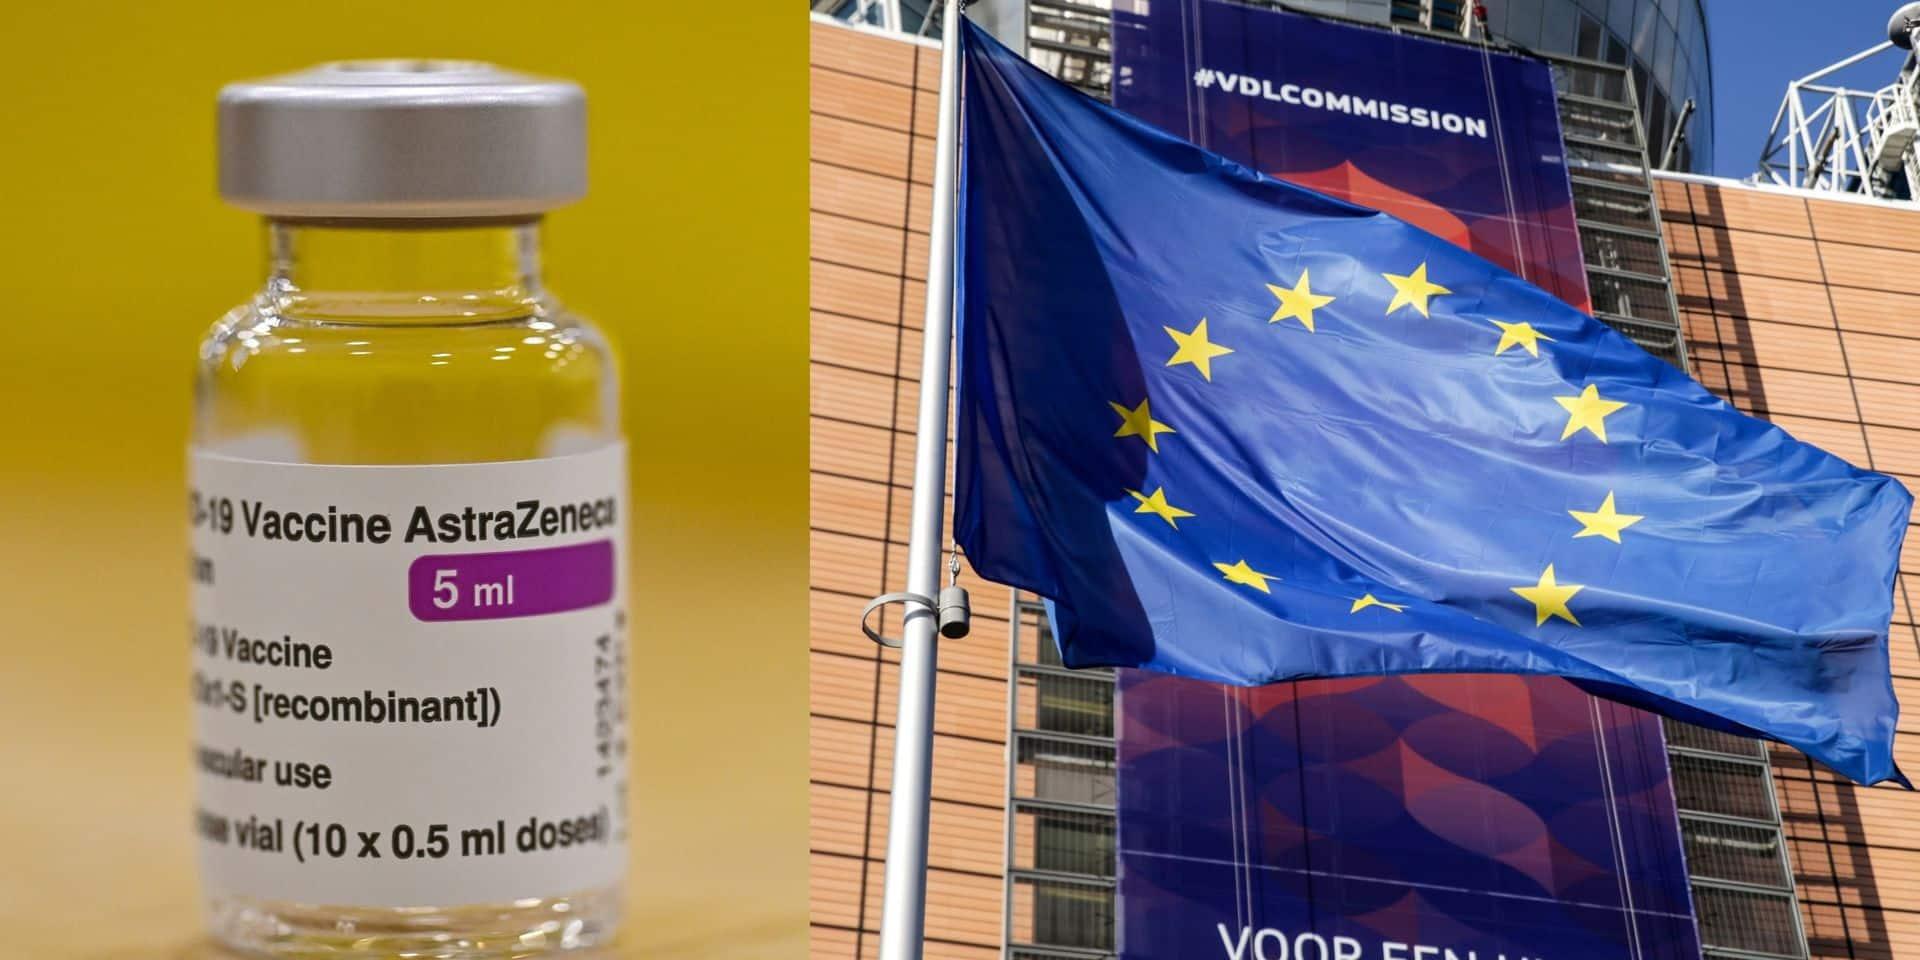 AstraZeneca et l'UE s'expliqueront le 26 mai devant la justice belge